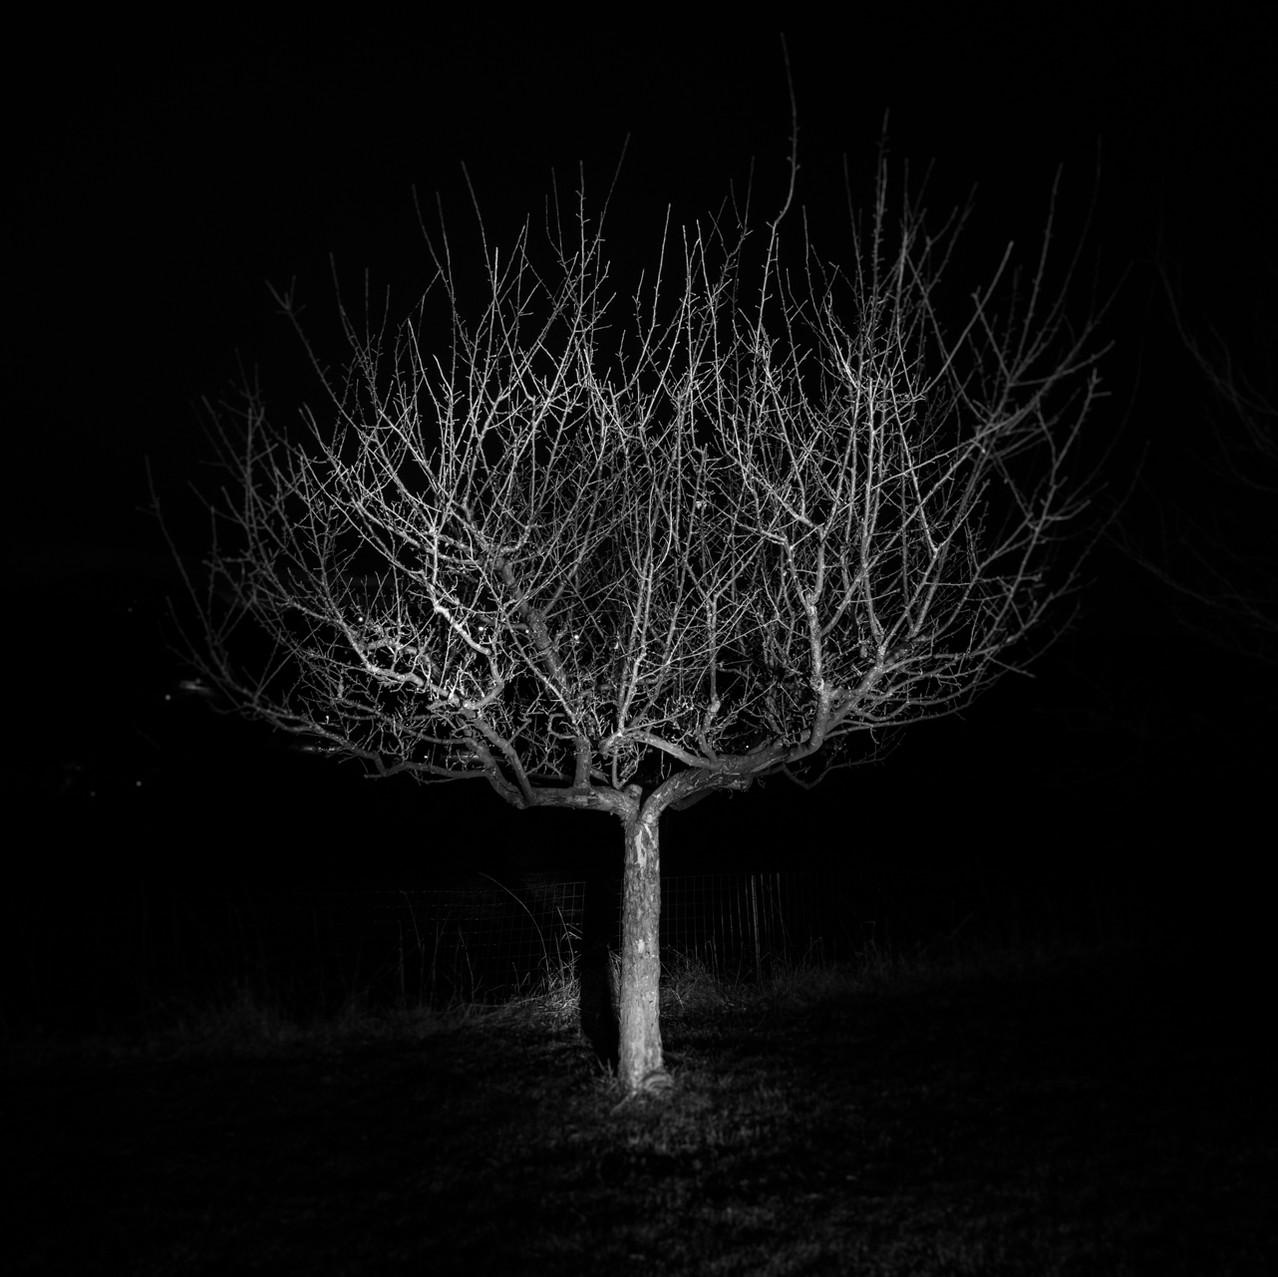 Ghost Trees III